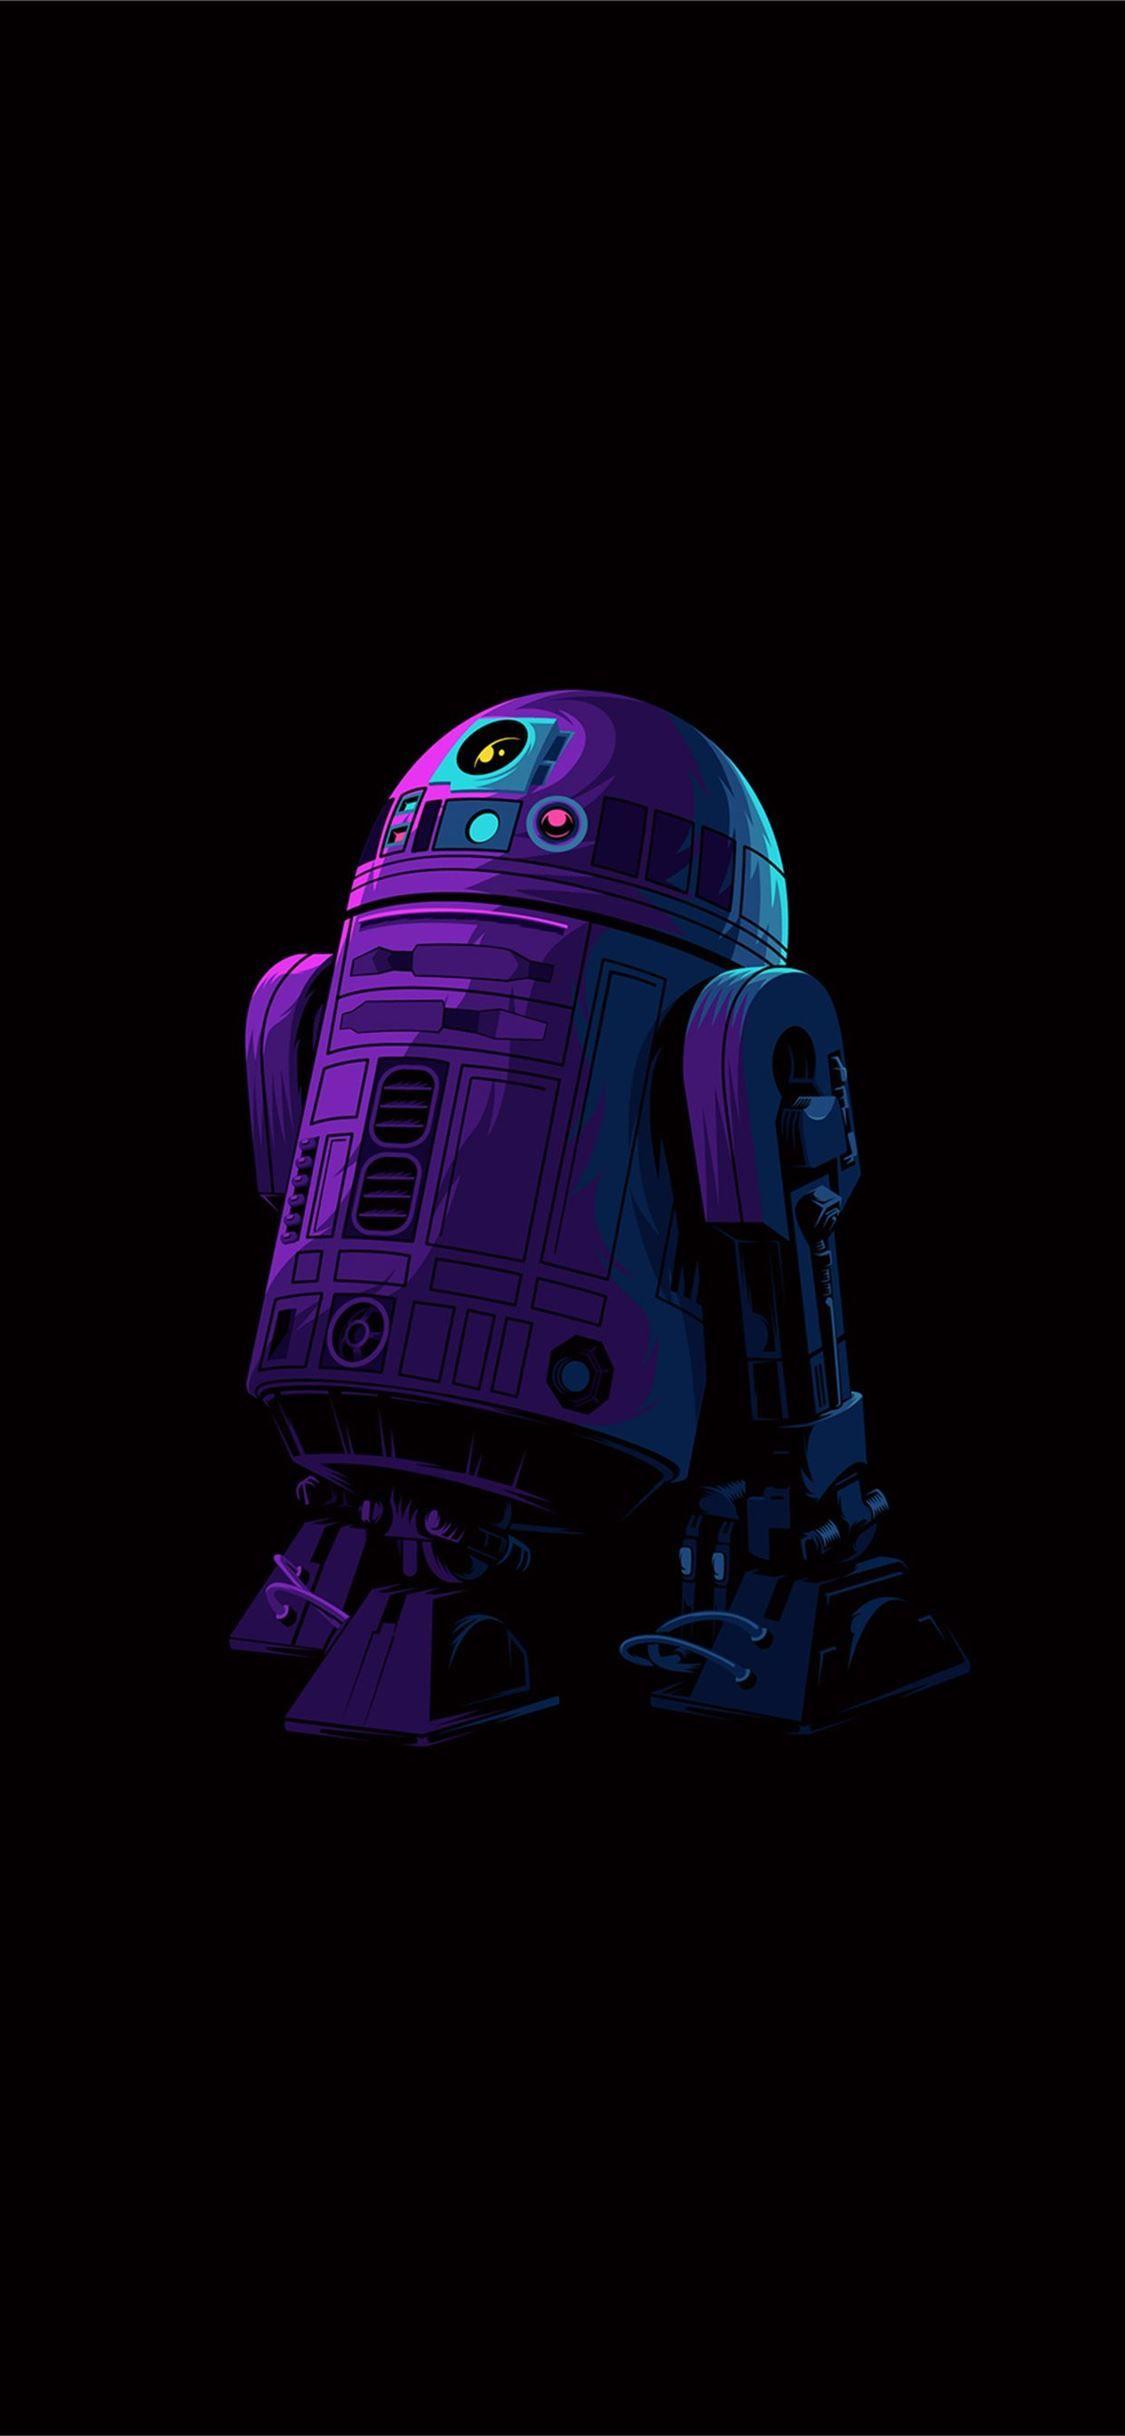 R2dr Minimalism Starwars Toy 4k Minimalism Artist Movies Iphone11wallpaper In 2020 Star Wars Wallpaper Star Wars Artwork Star Wars Art